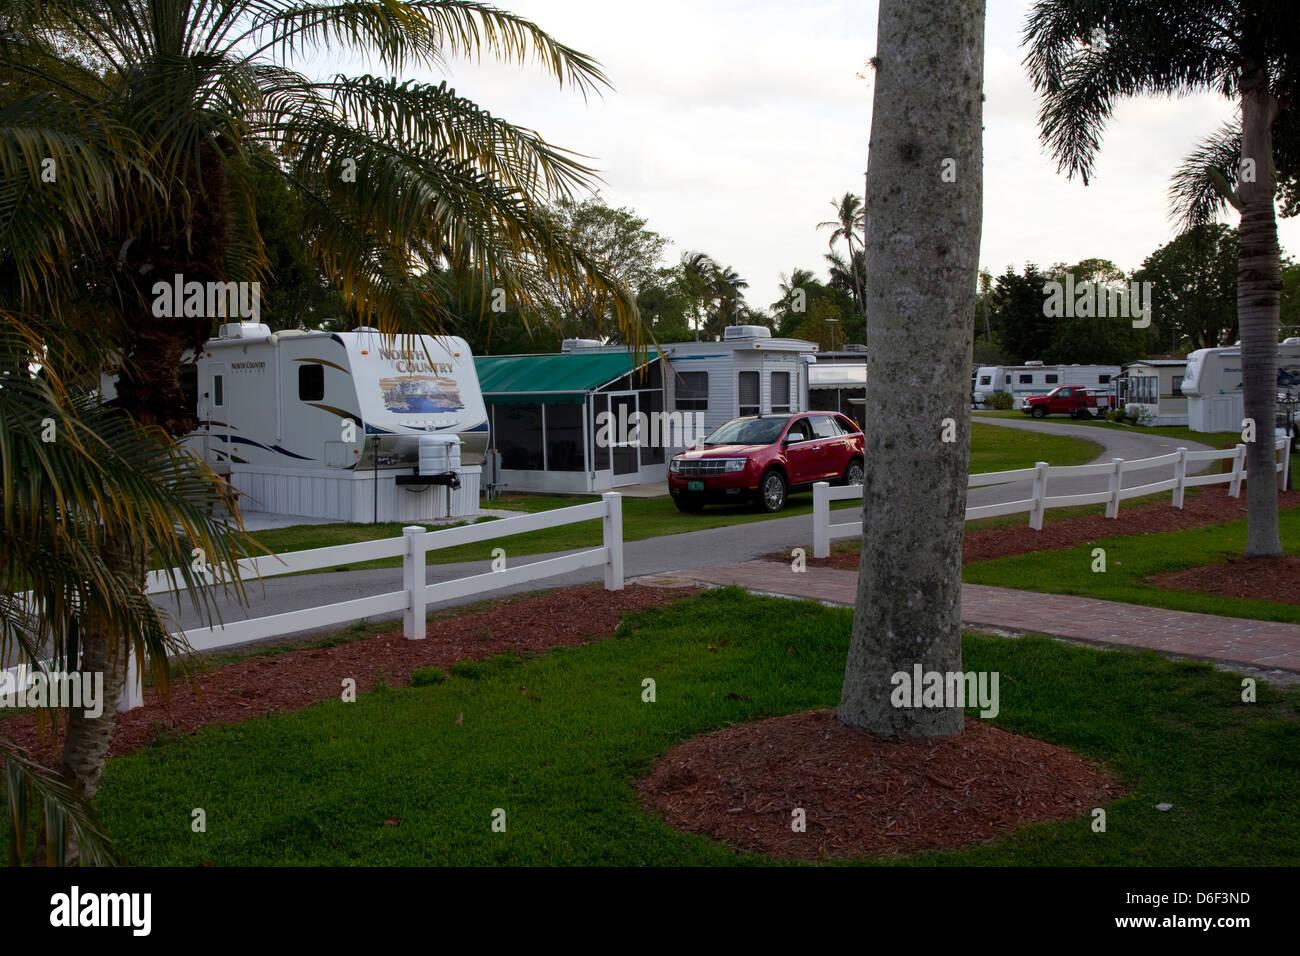 Crooked Hook RV Resort, near Lake Okeechobee, FL - Stock Image